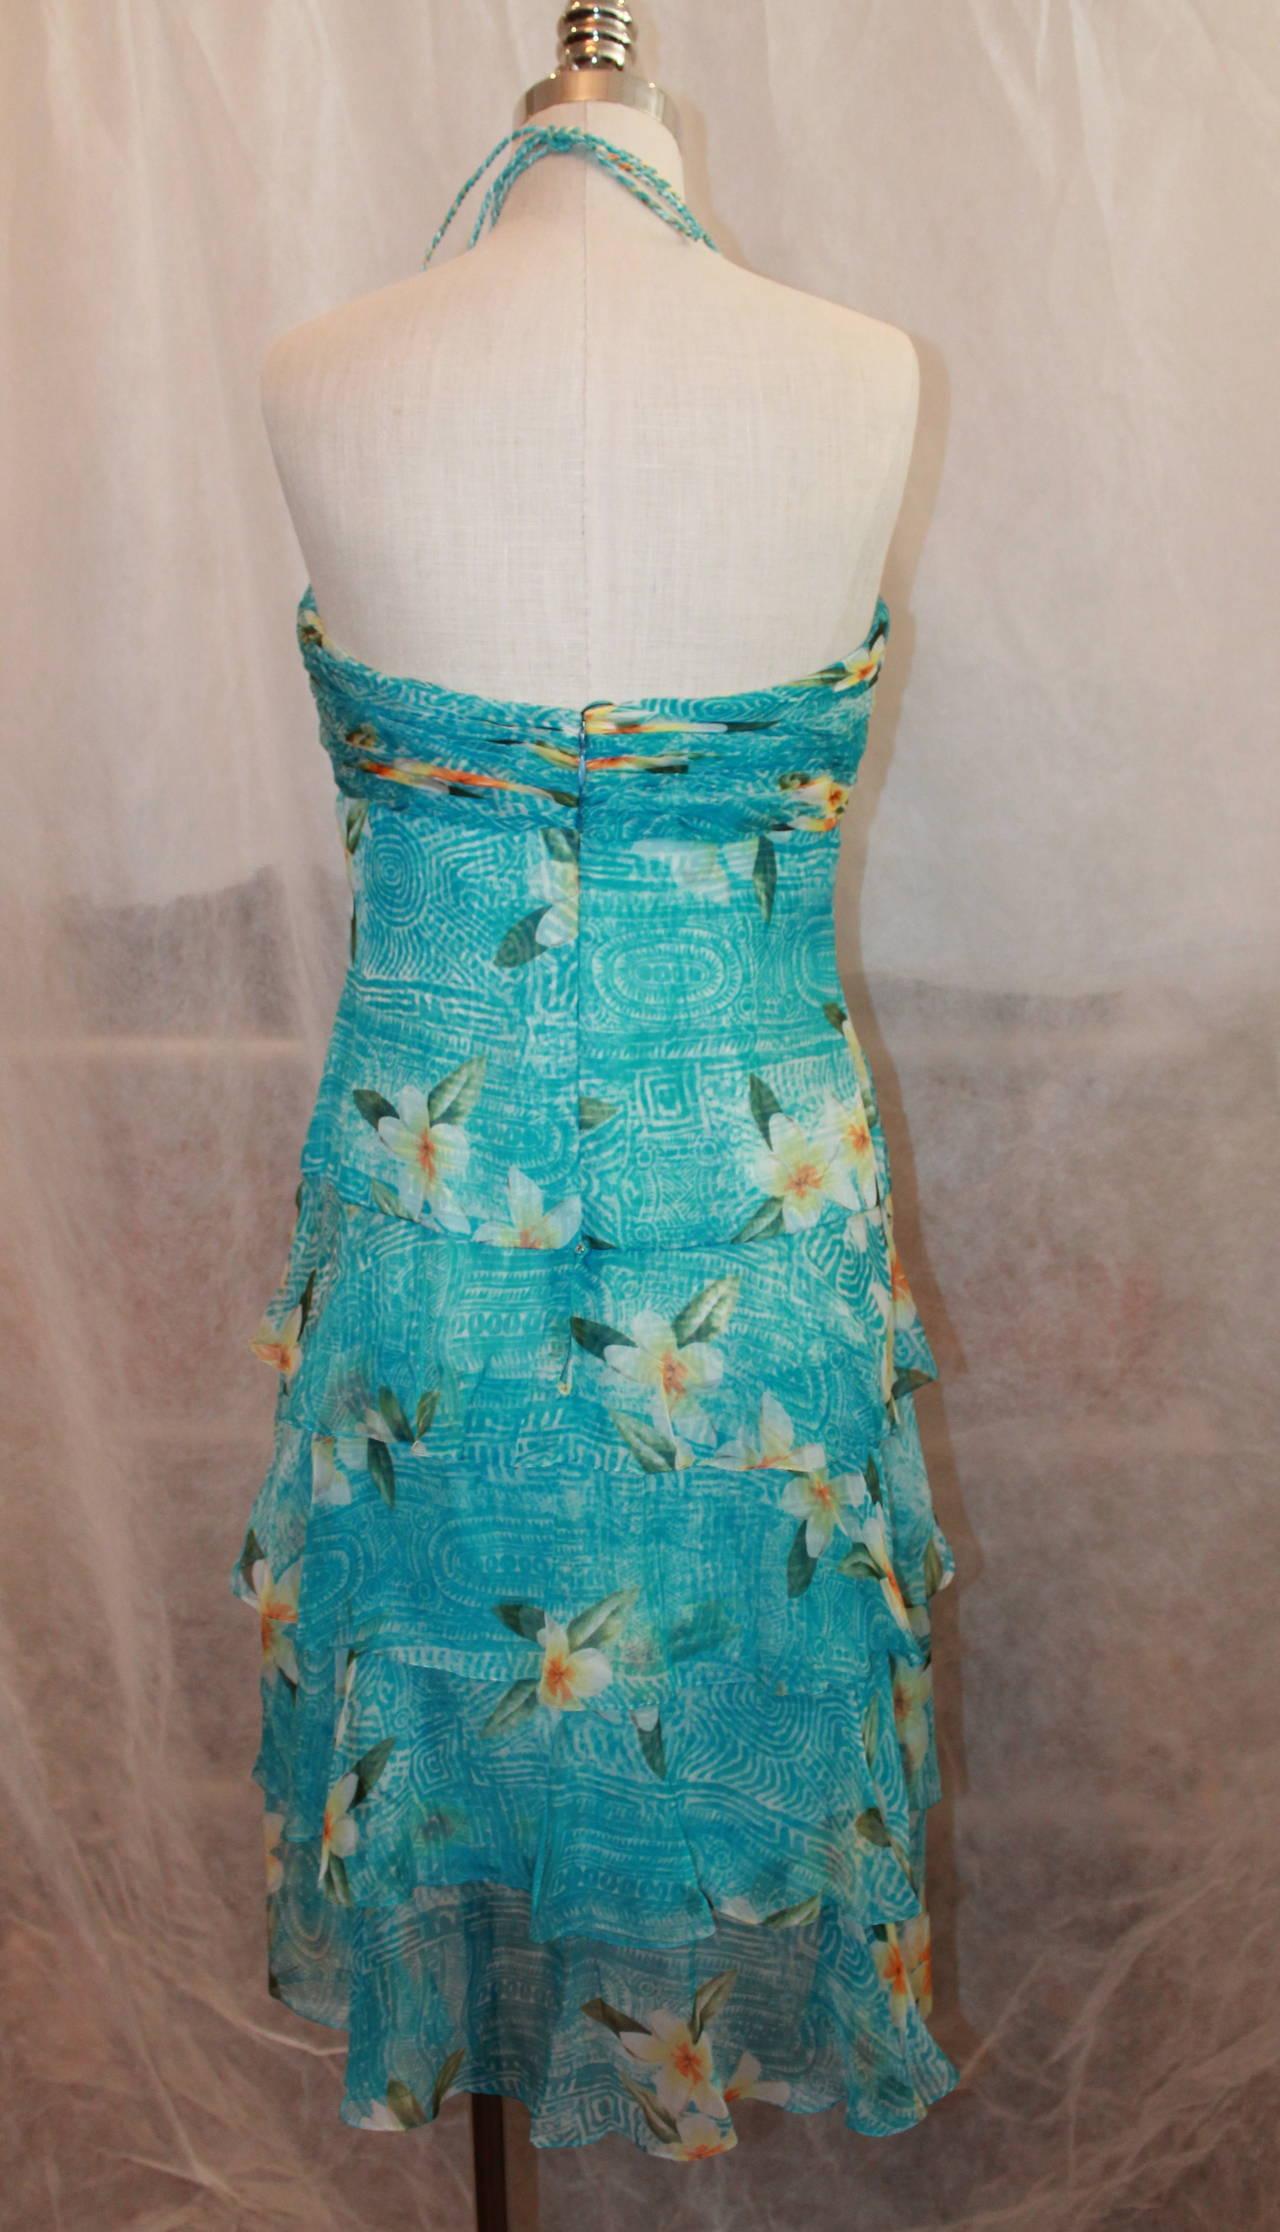 Oscar de la Renta Blue Hawaiian Print Halter Dress & Shawl - 10 For Sale 1